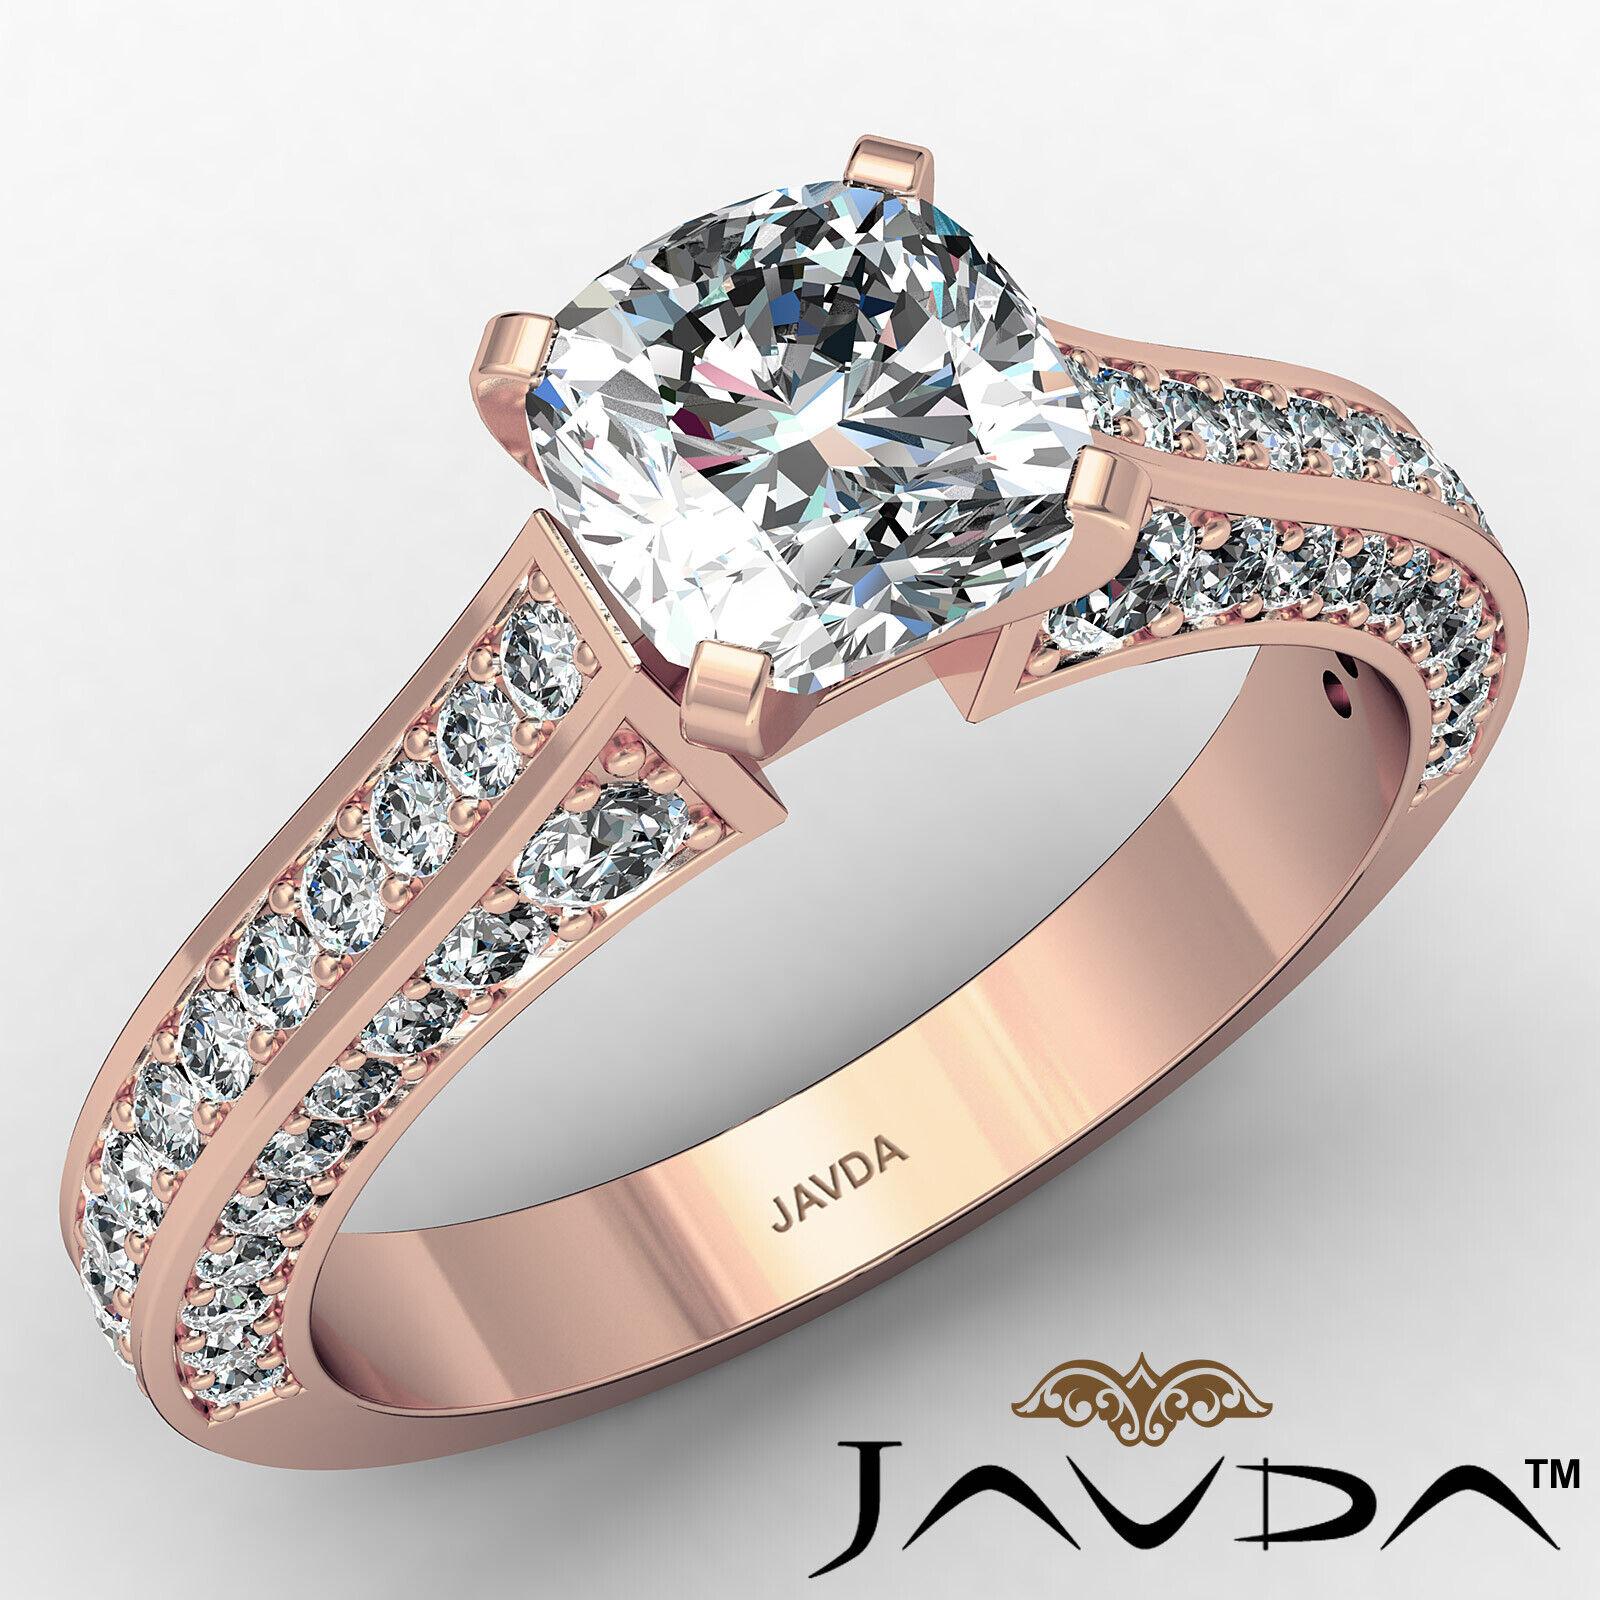 Cushion Diamond Engagement Pave Set Ring GIA J Color & VS2 clarity 1.82ctw 2